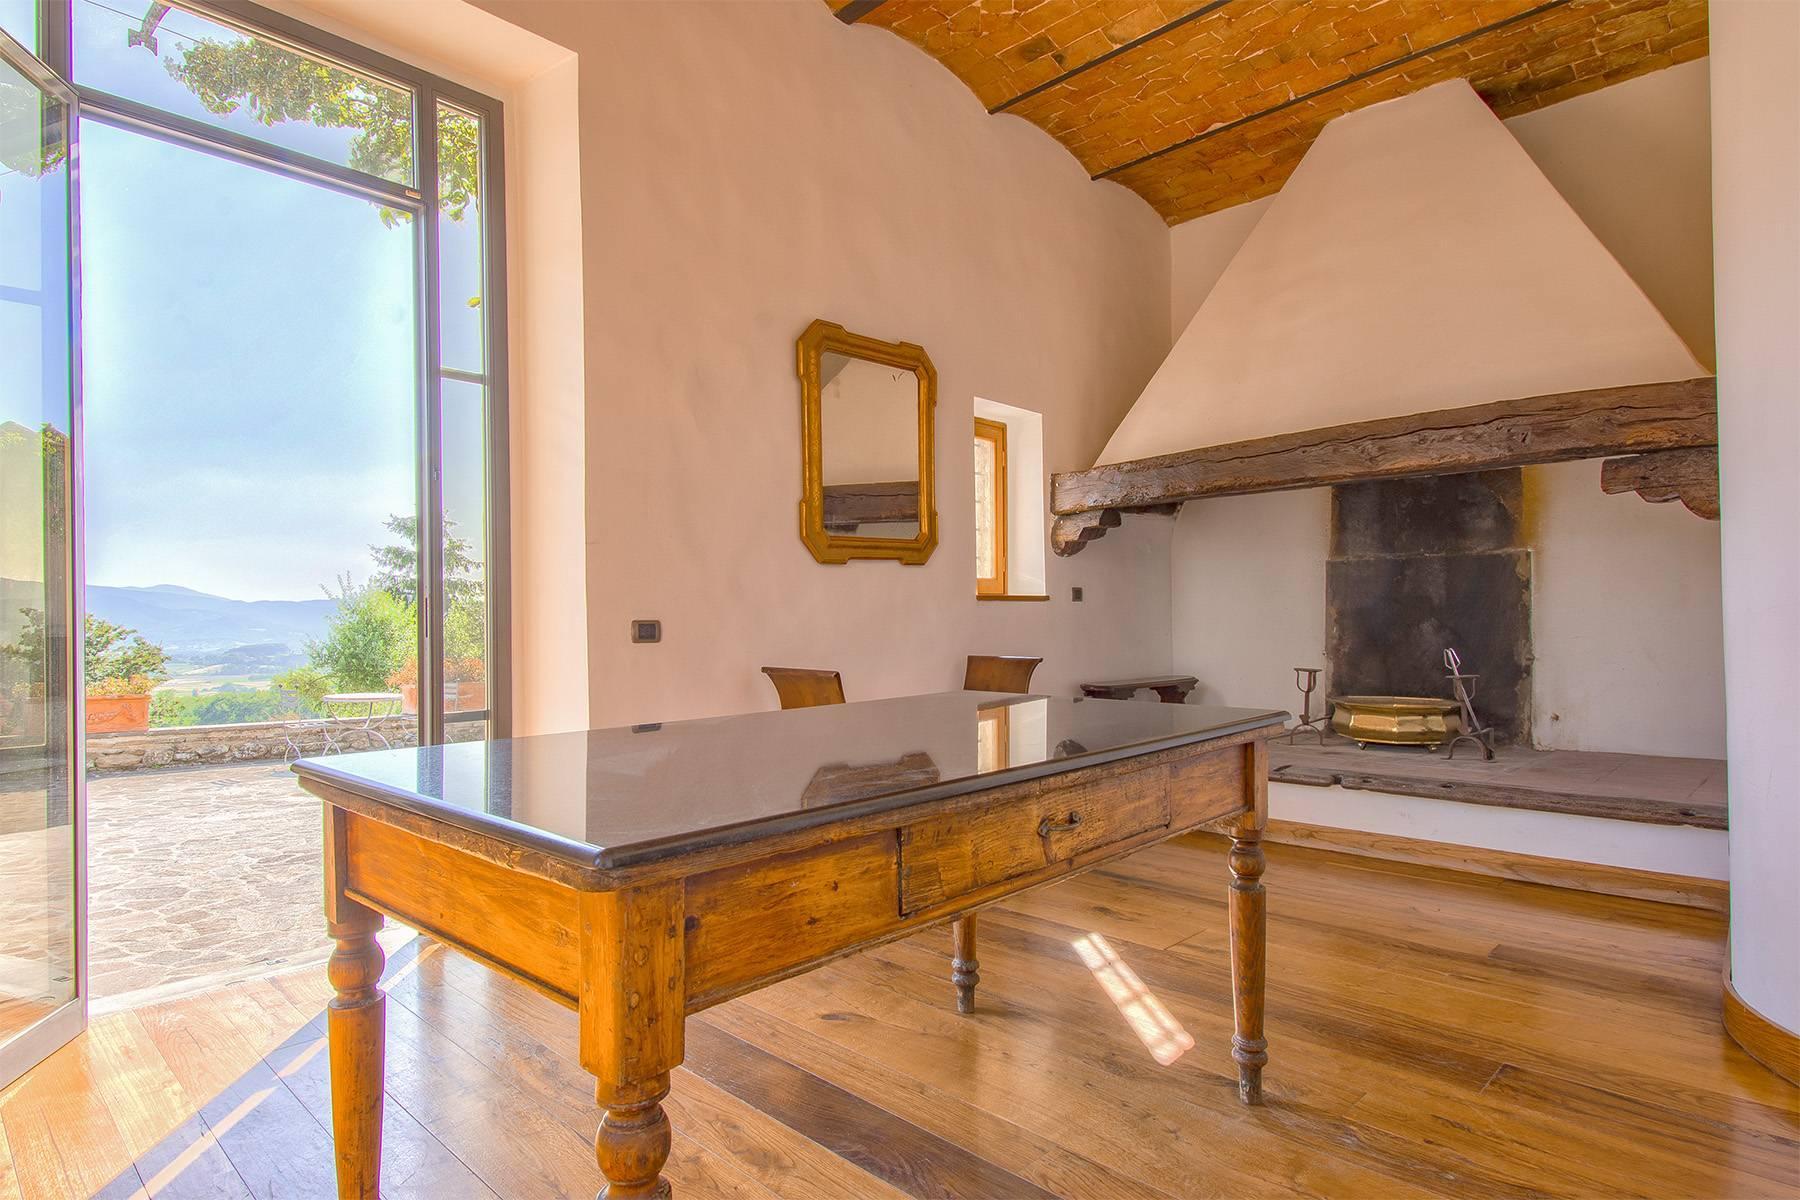 Farmhouse nestled on the Tuscan hills - 8